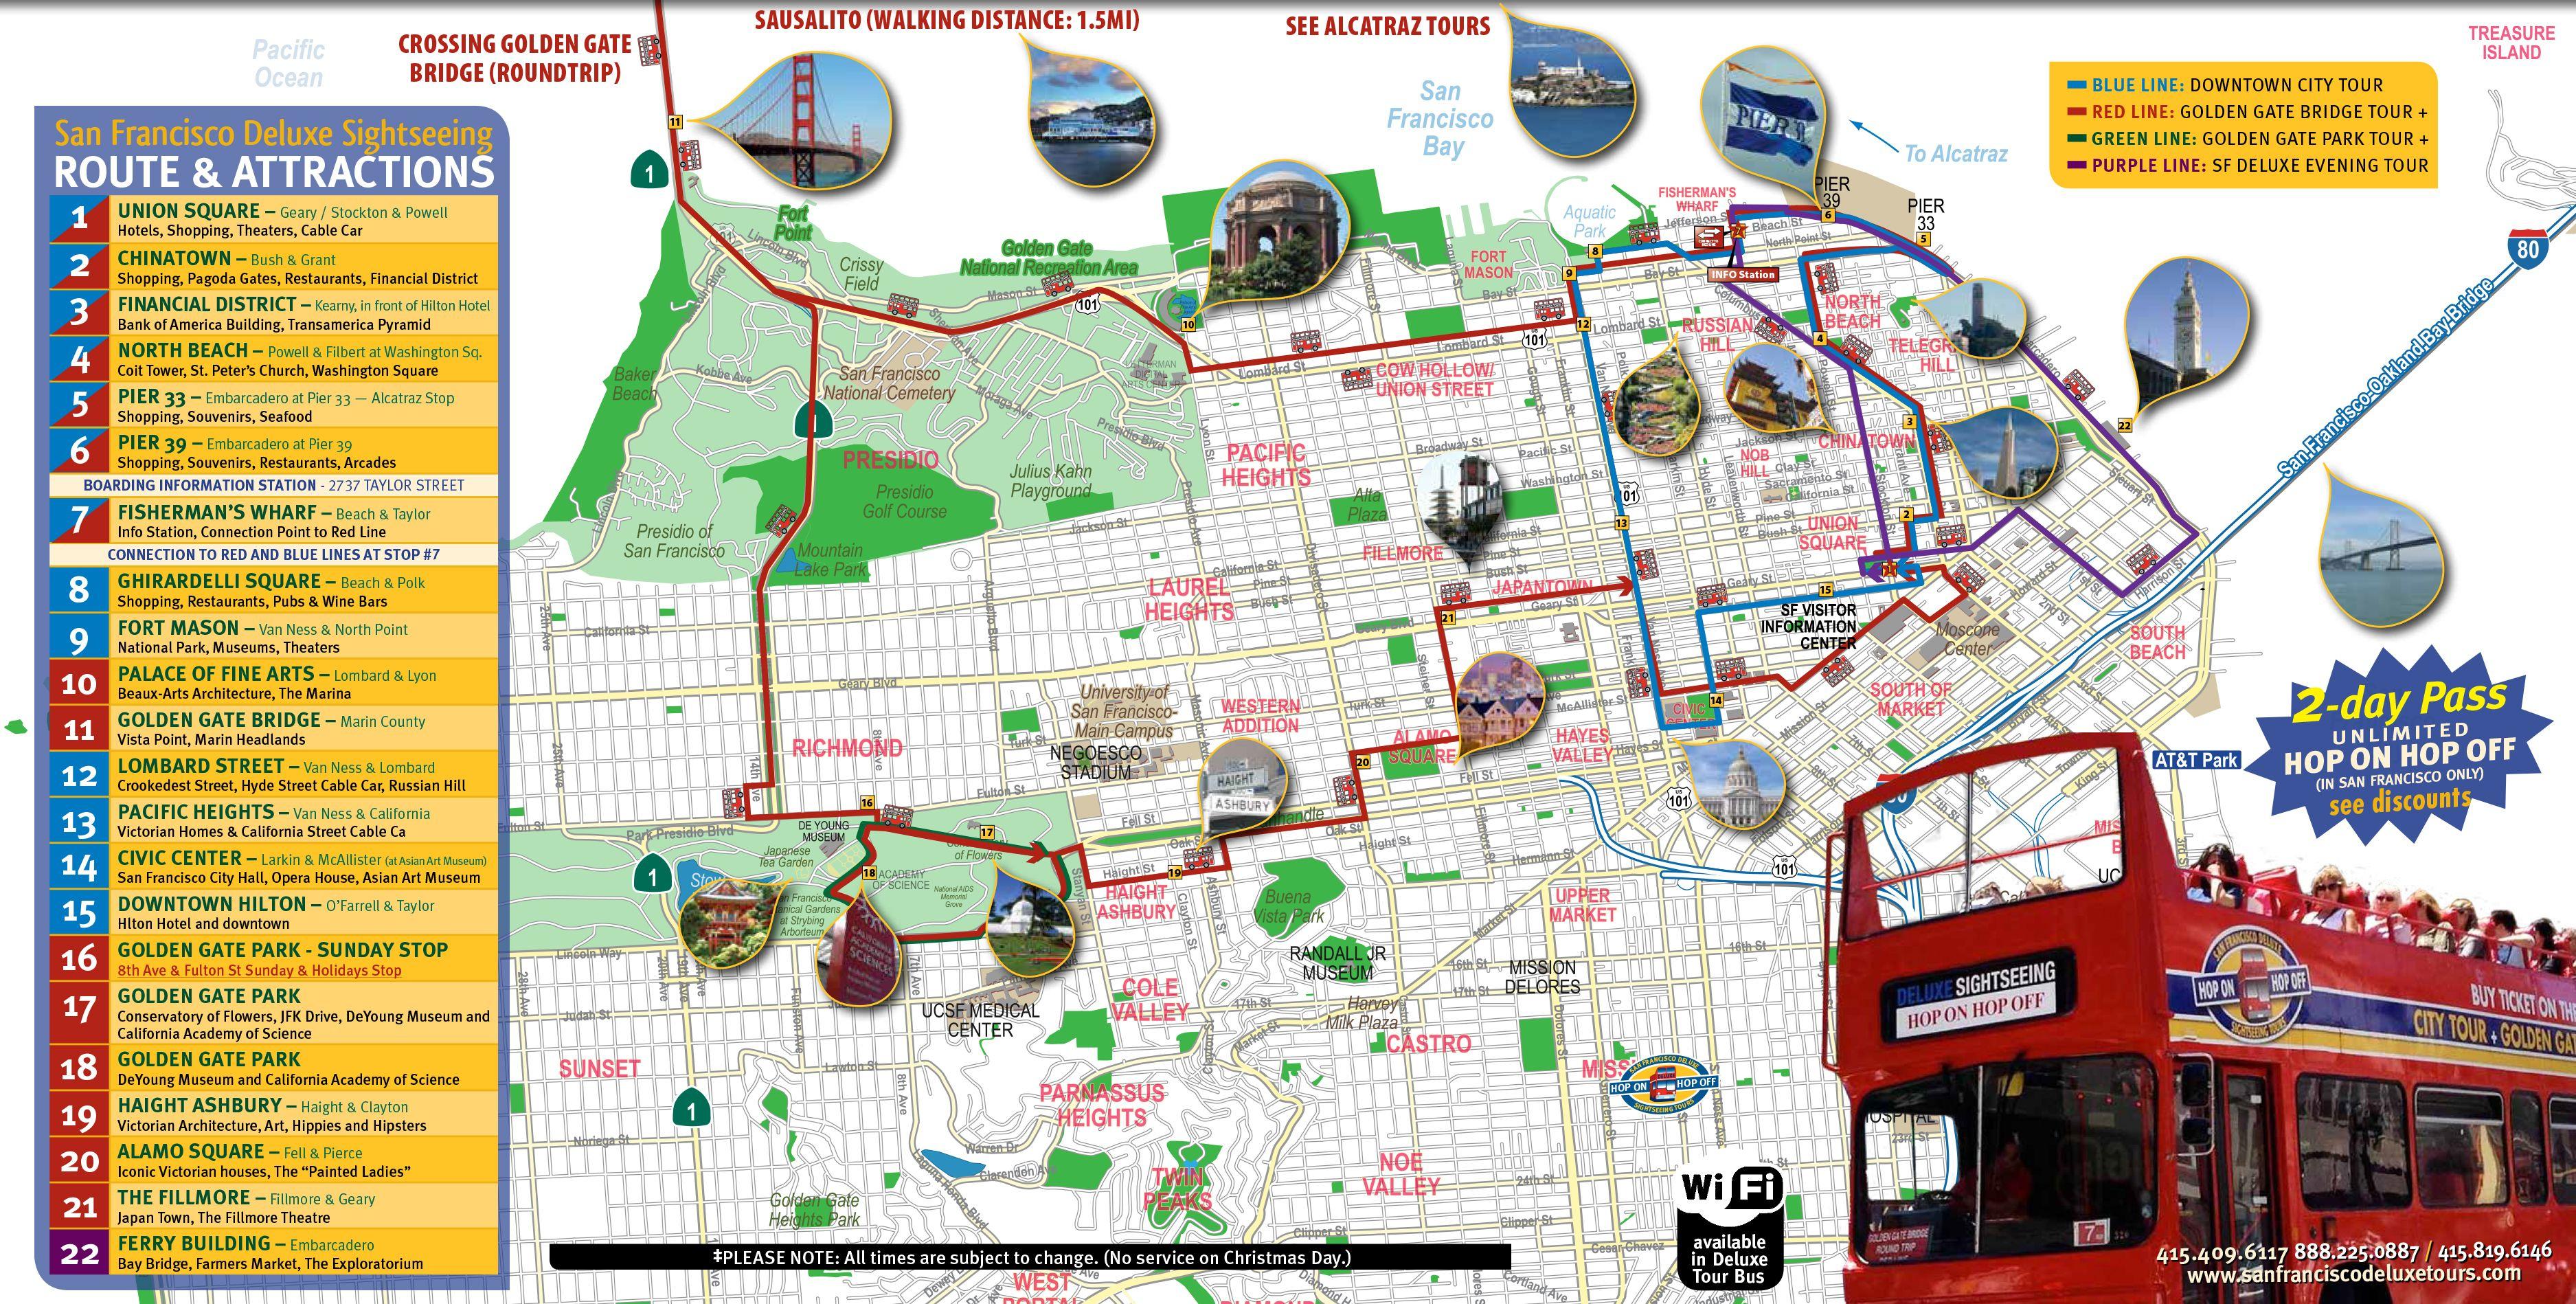 San Francisco Tourist Map Printable | Maps Update #21051488: San - San Francisco City Map Printable